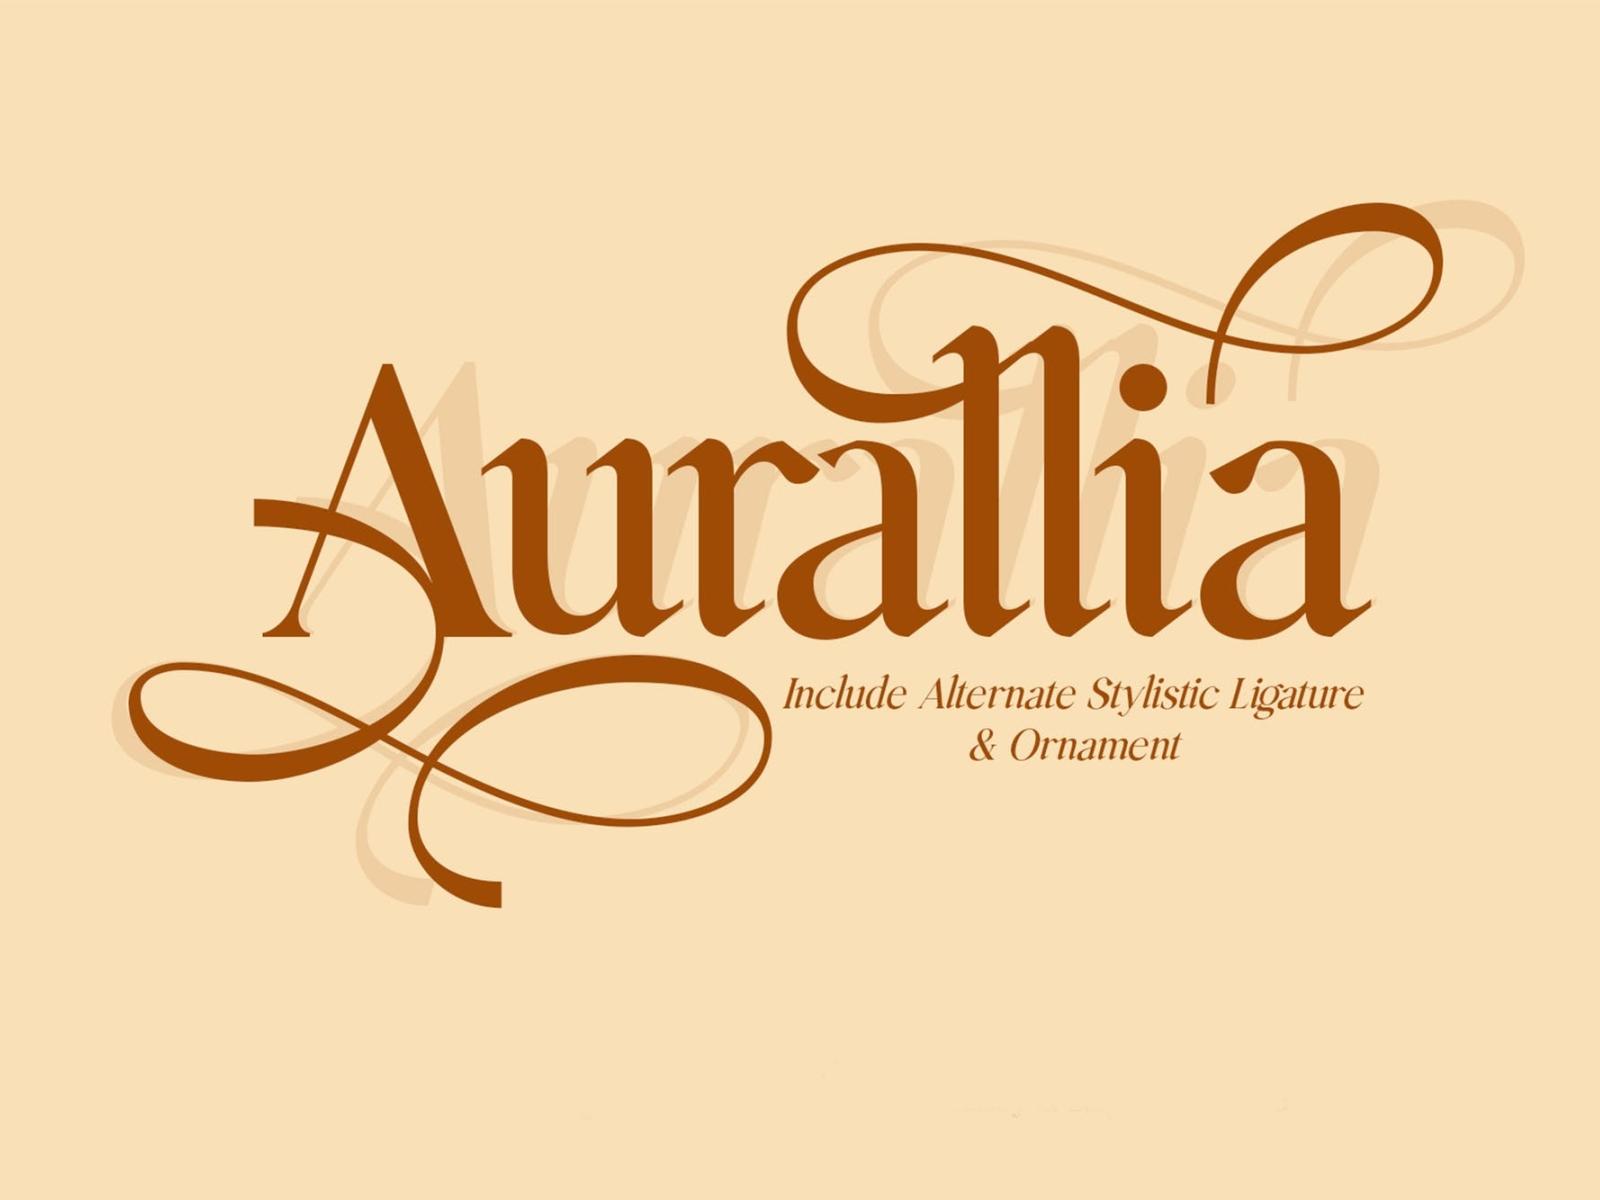 Auralia Display Font stylish font display serif stylish font aurallia ux vector ui app logo typography illustration graphic design design branding